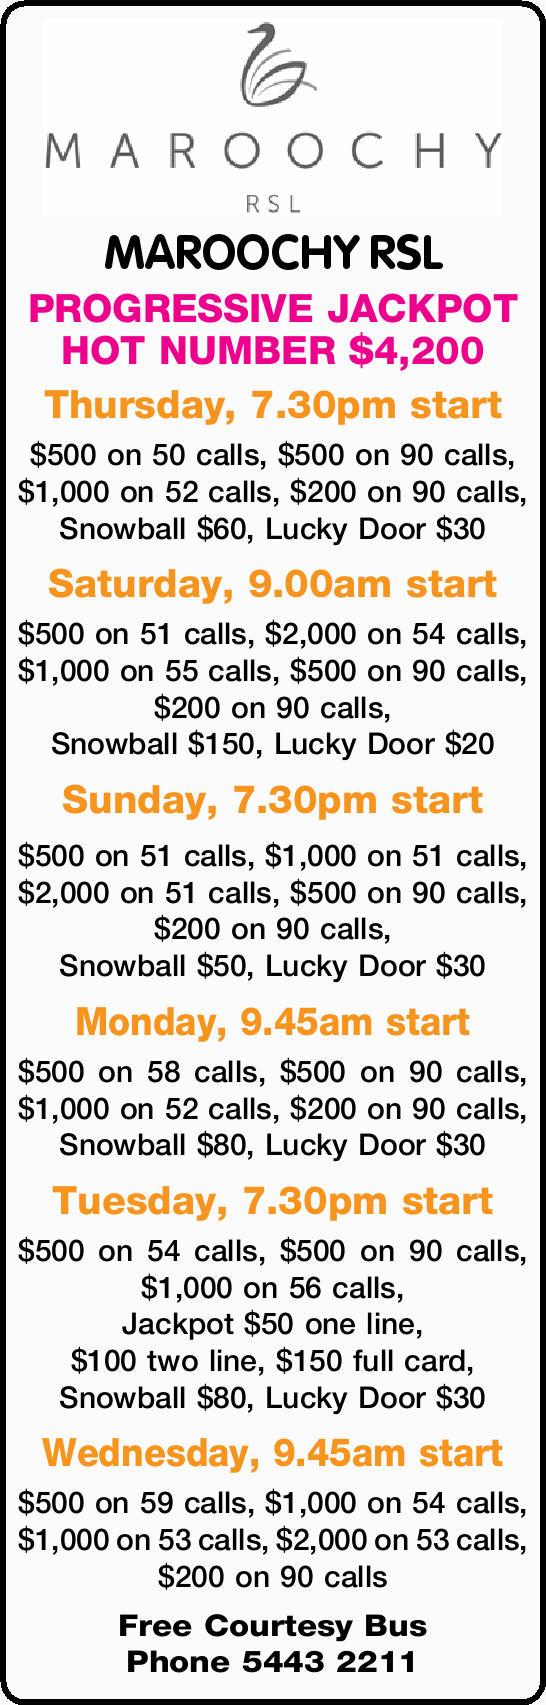 MAROOCHY RSL PROGRESSIVE JACKPOT HOT NUMBER $4,200 Thursday, 7.30pm start $500 on 50 calls, $500...